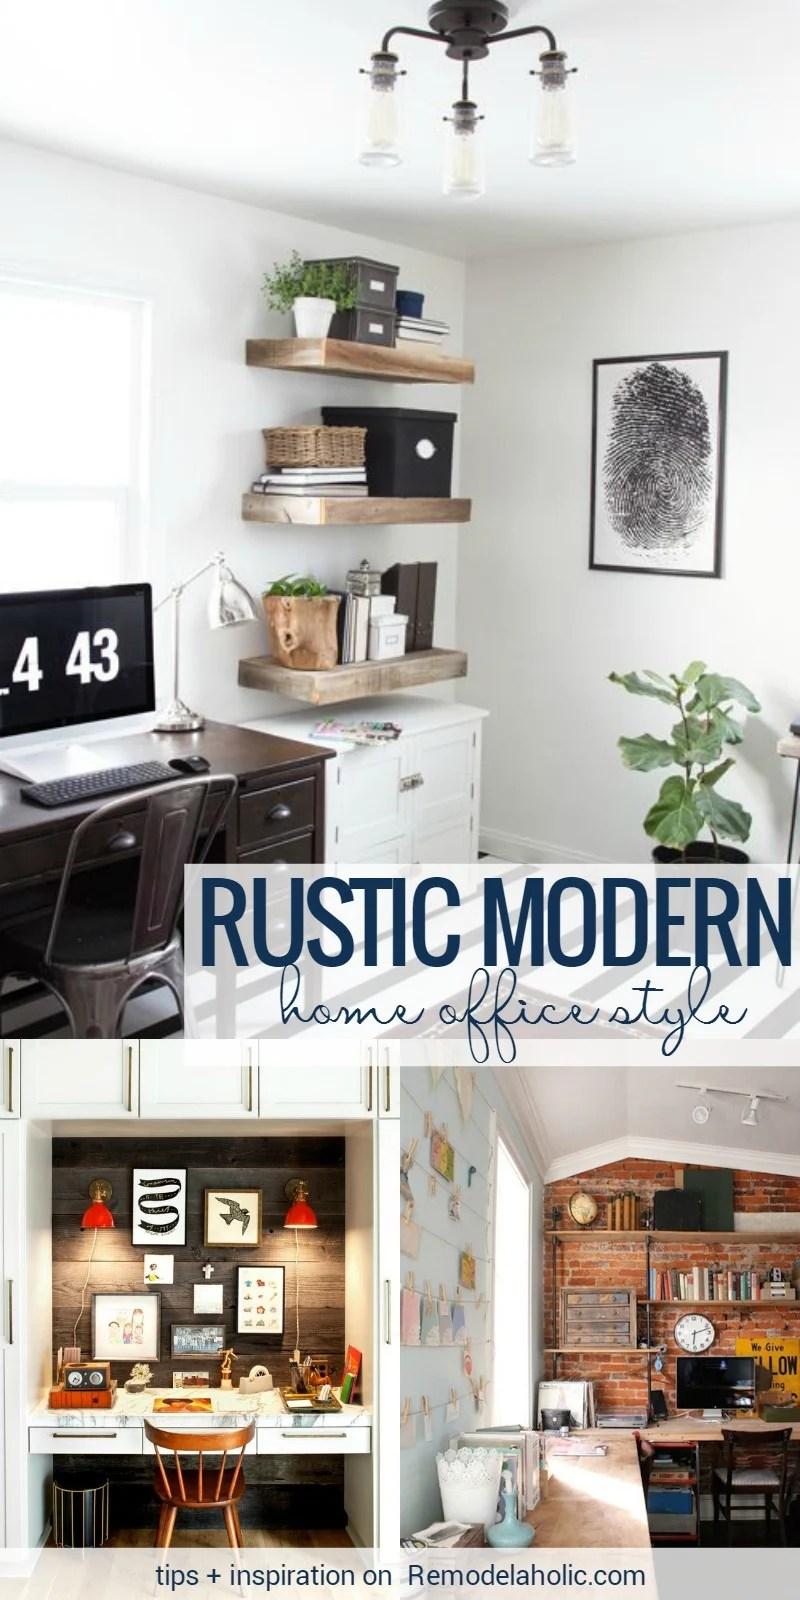 Remodelaholic | Rustic Modern Home Office Design Inspiration & Tips